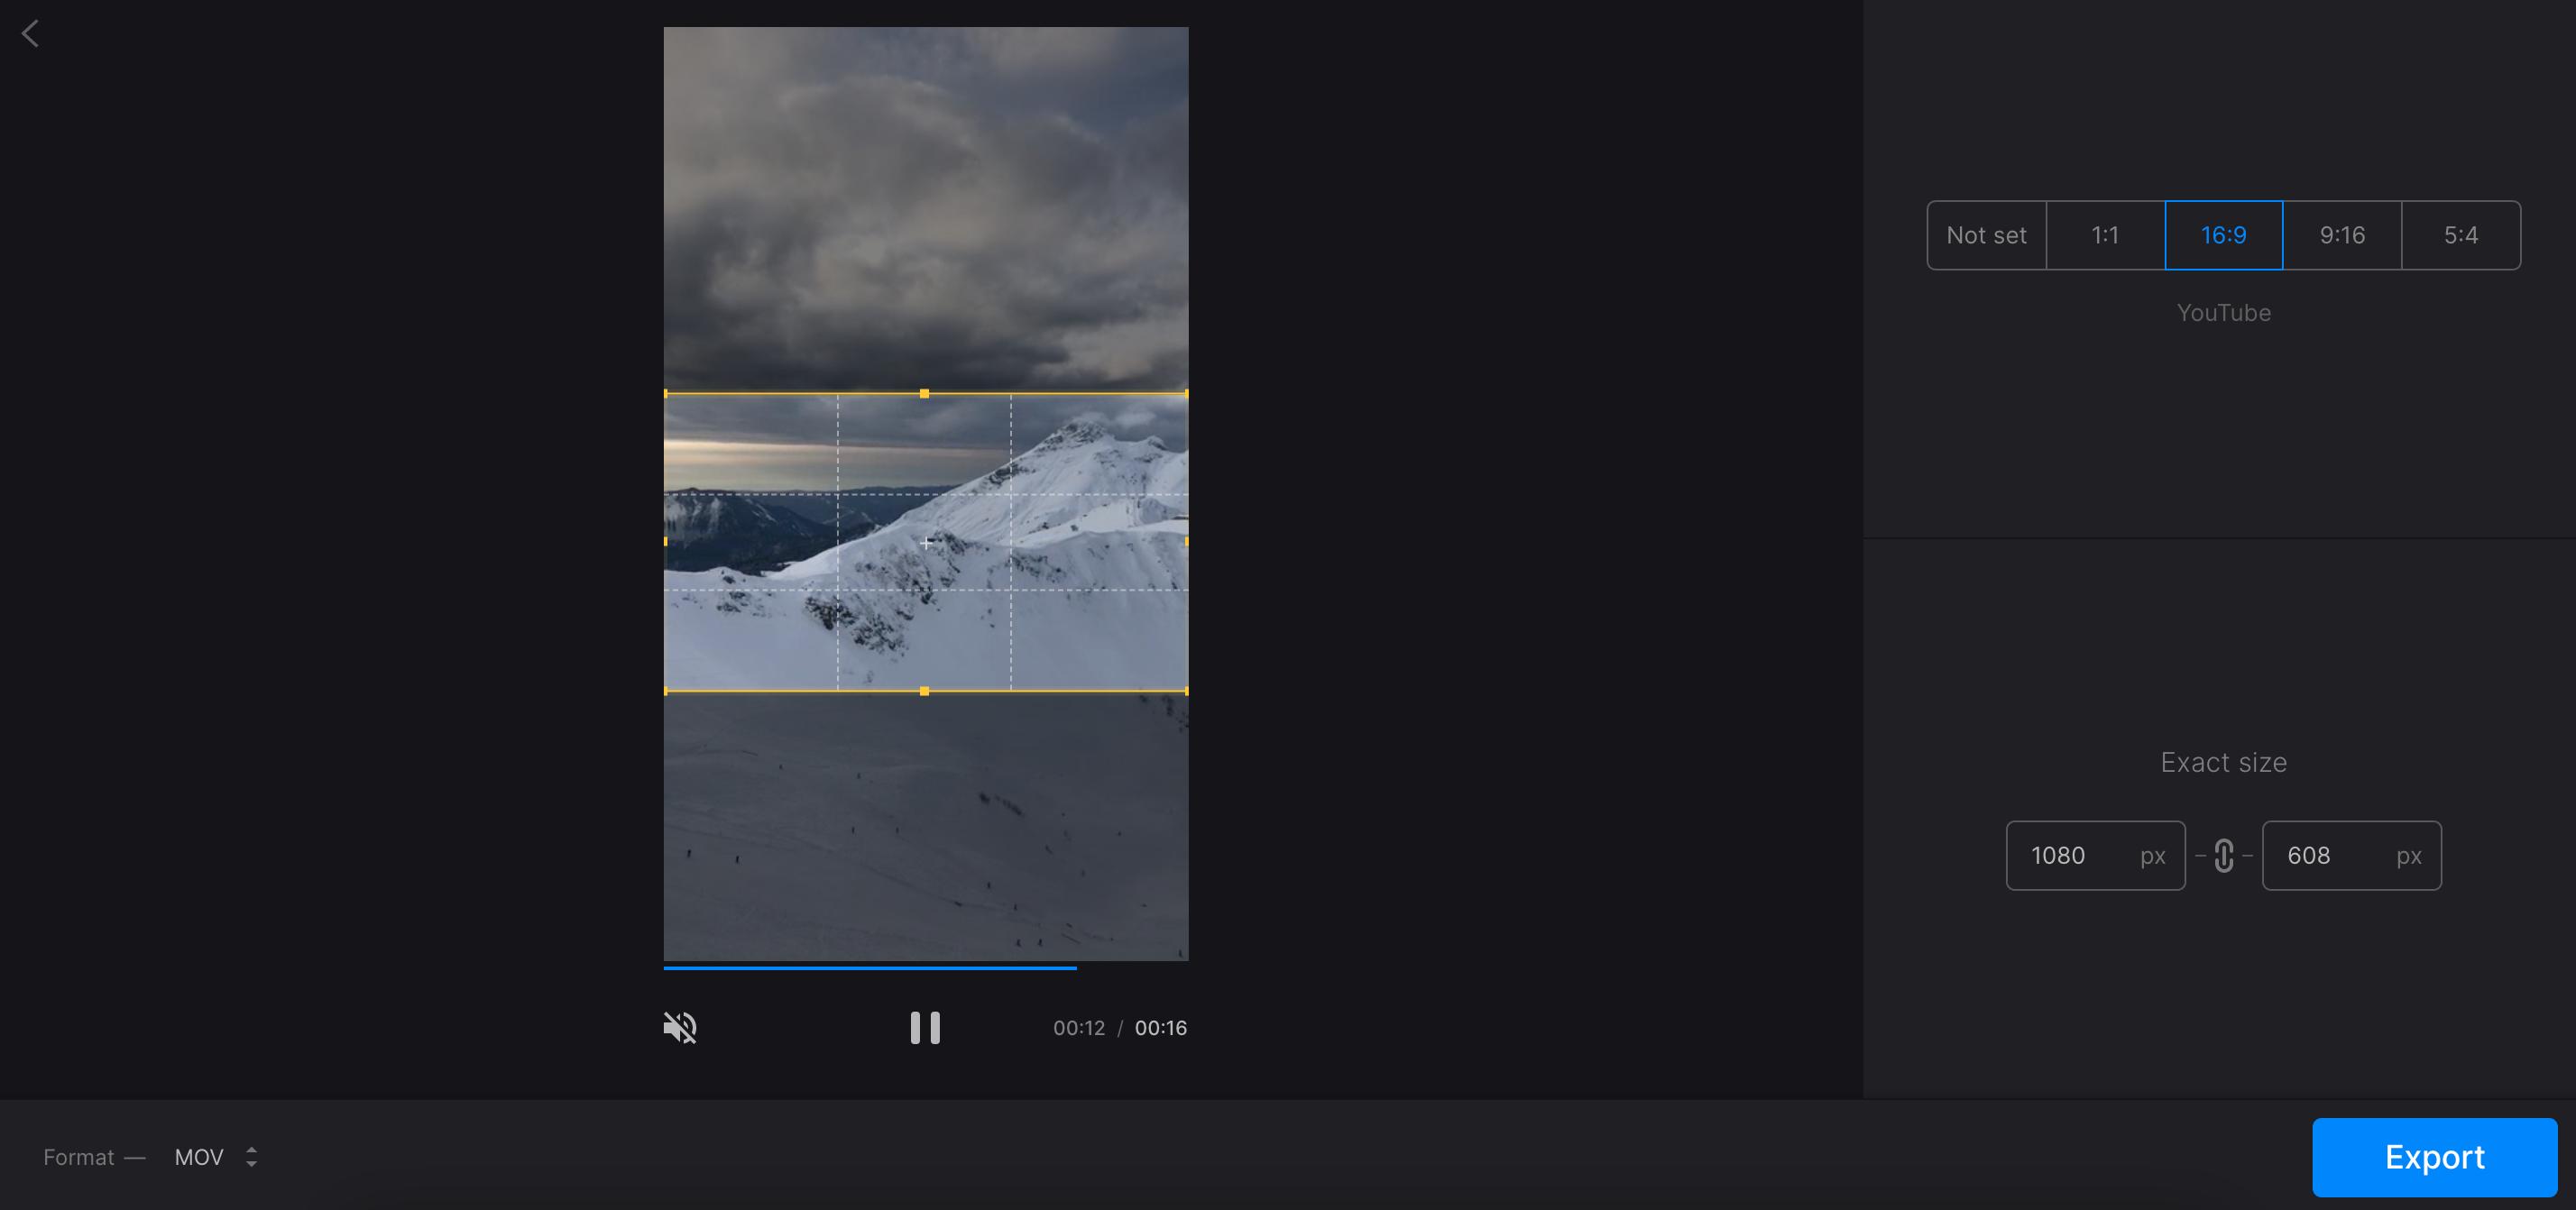 Crop vertical video to make it horizontal